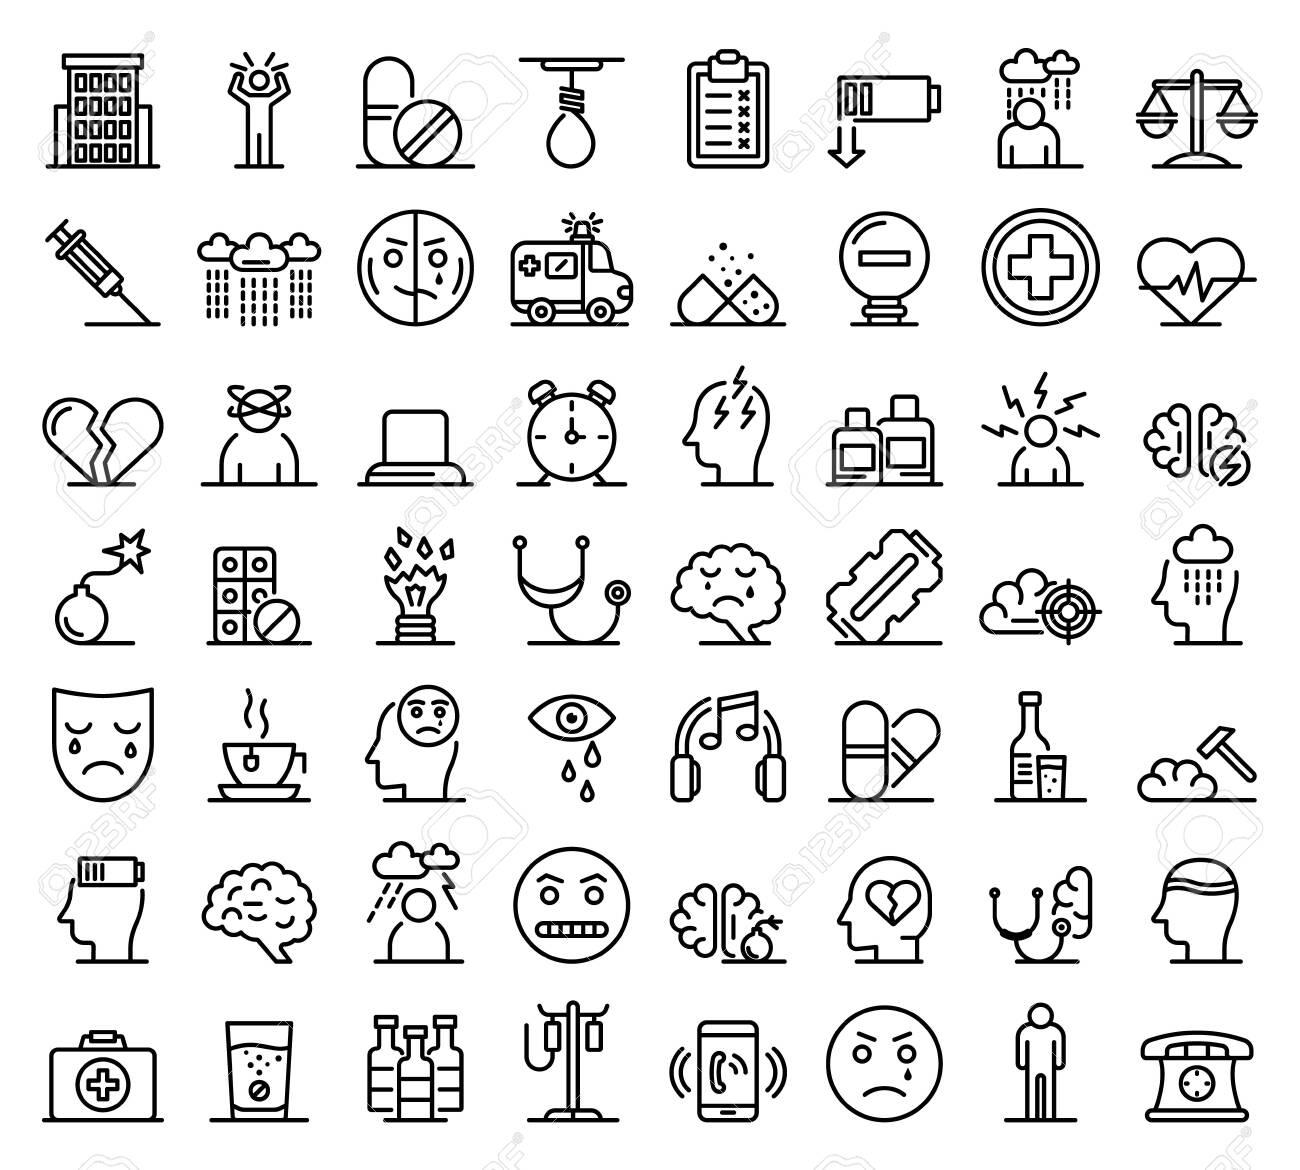 Depression icons set, outline style - 128639142